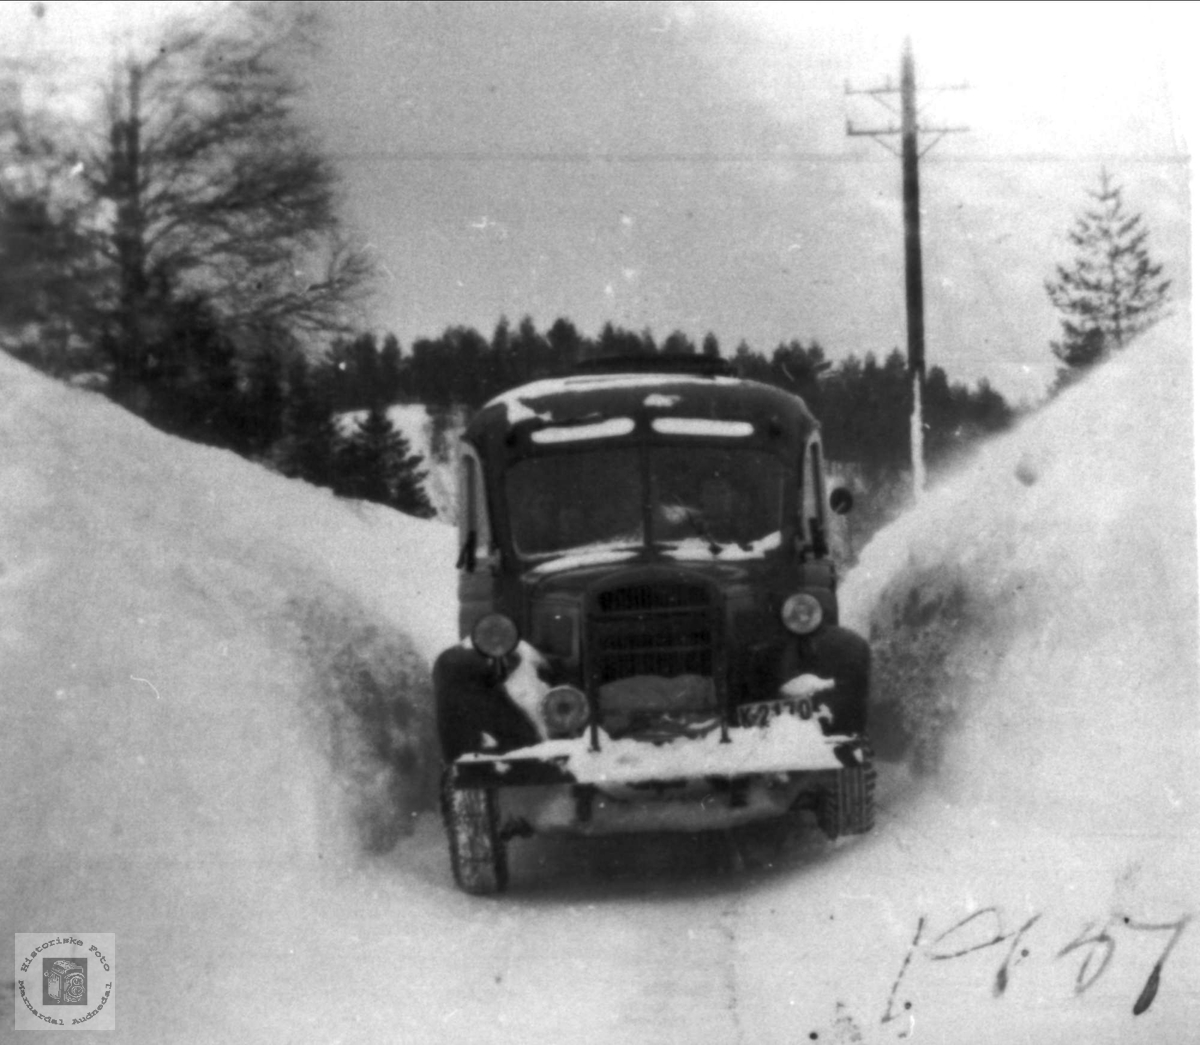 Snøvinteren 1951 på Kolandsheia, Bjelland.